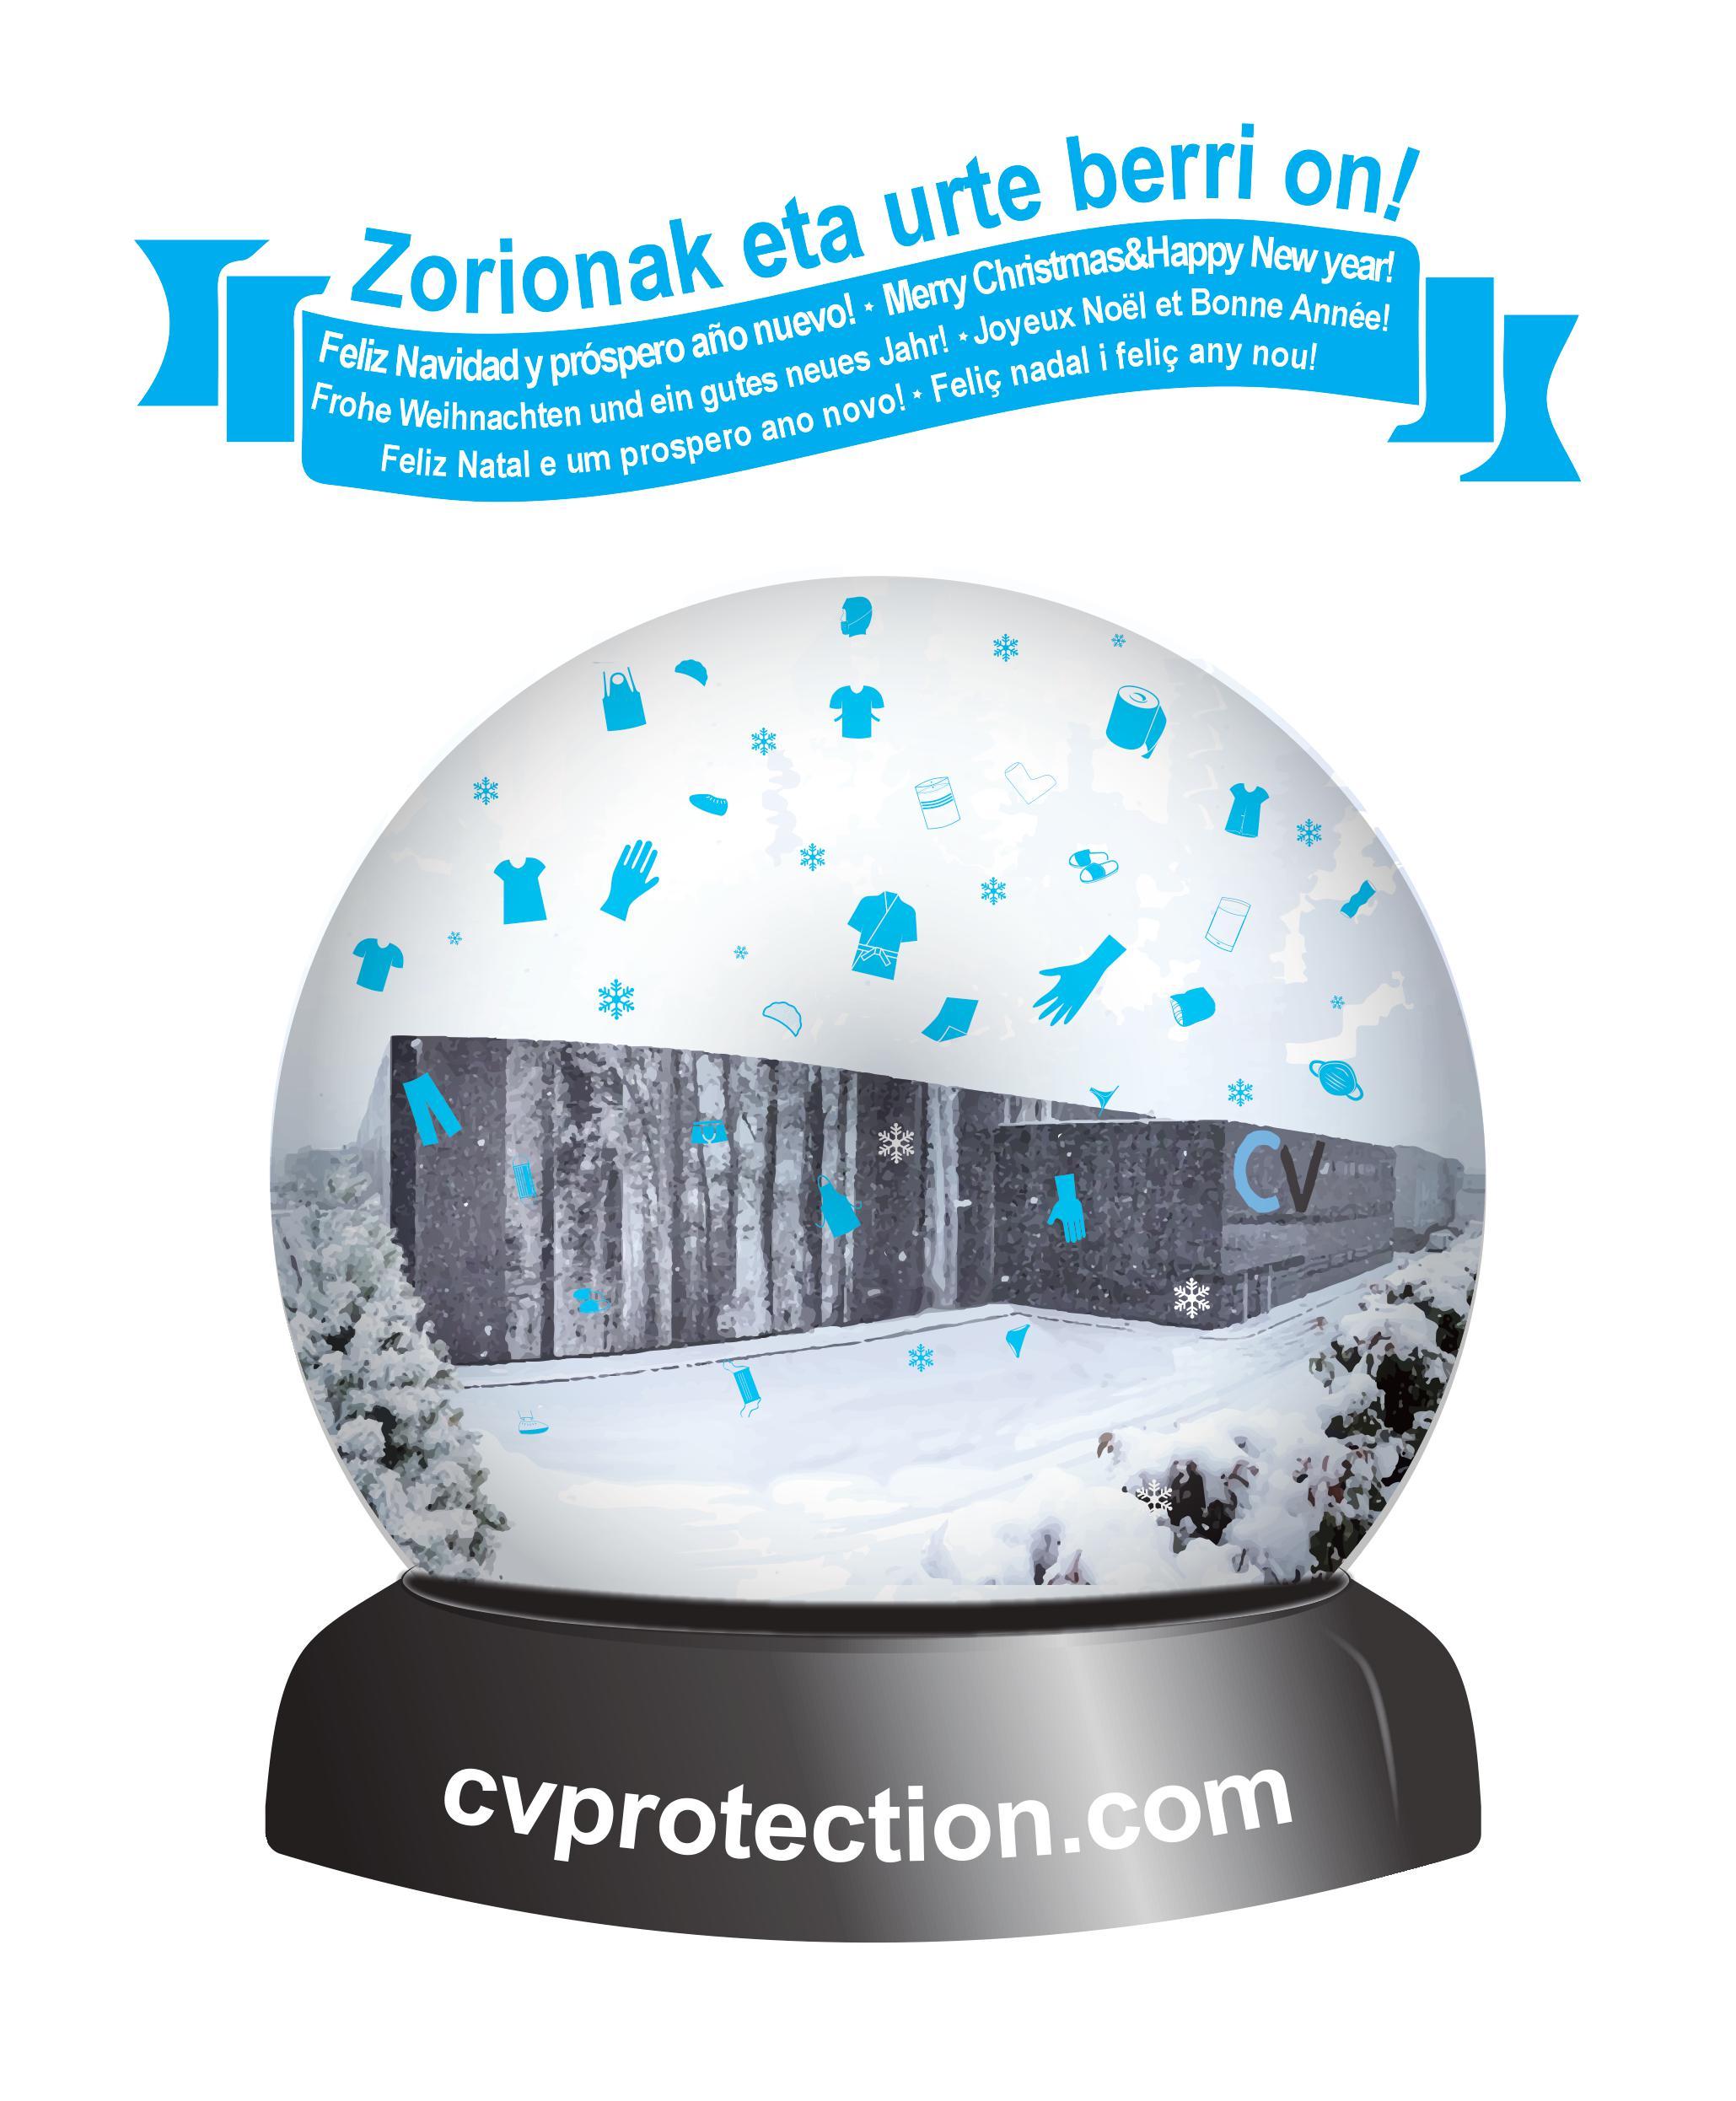 navidad cv protection celulosas vascas